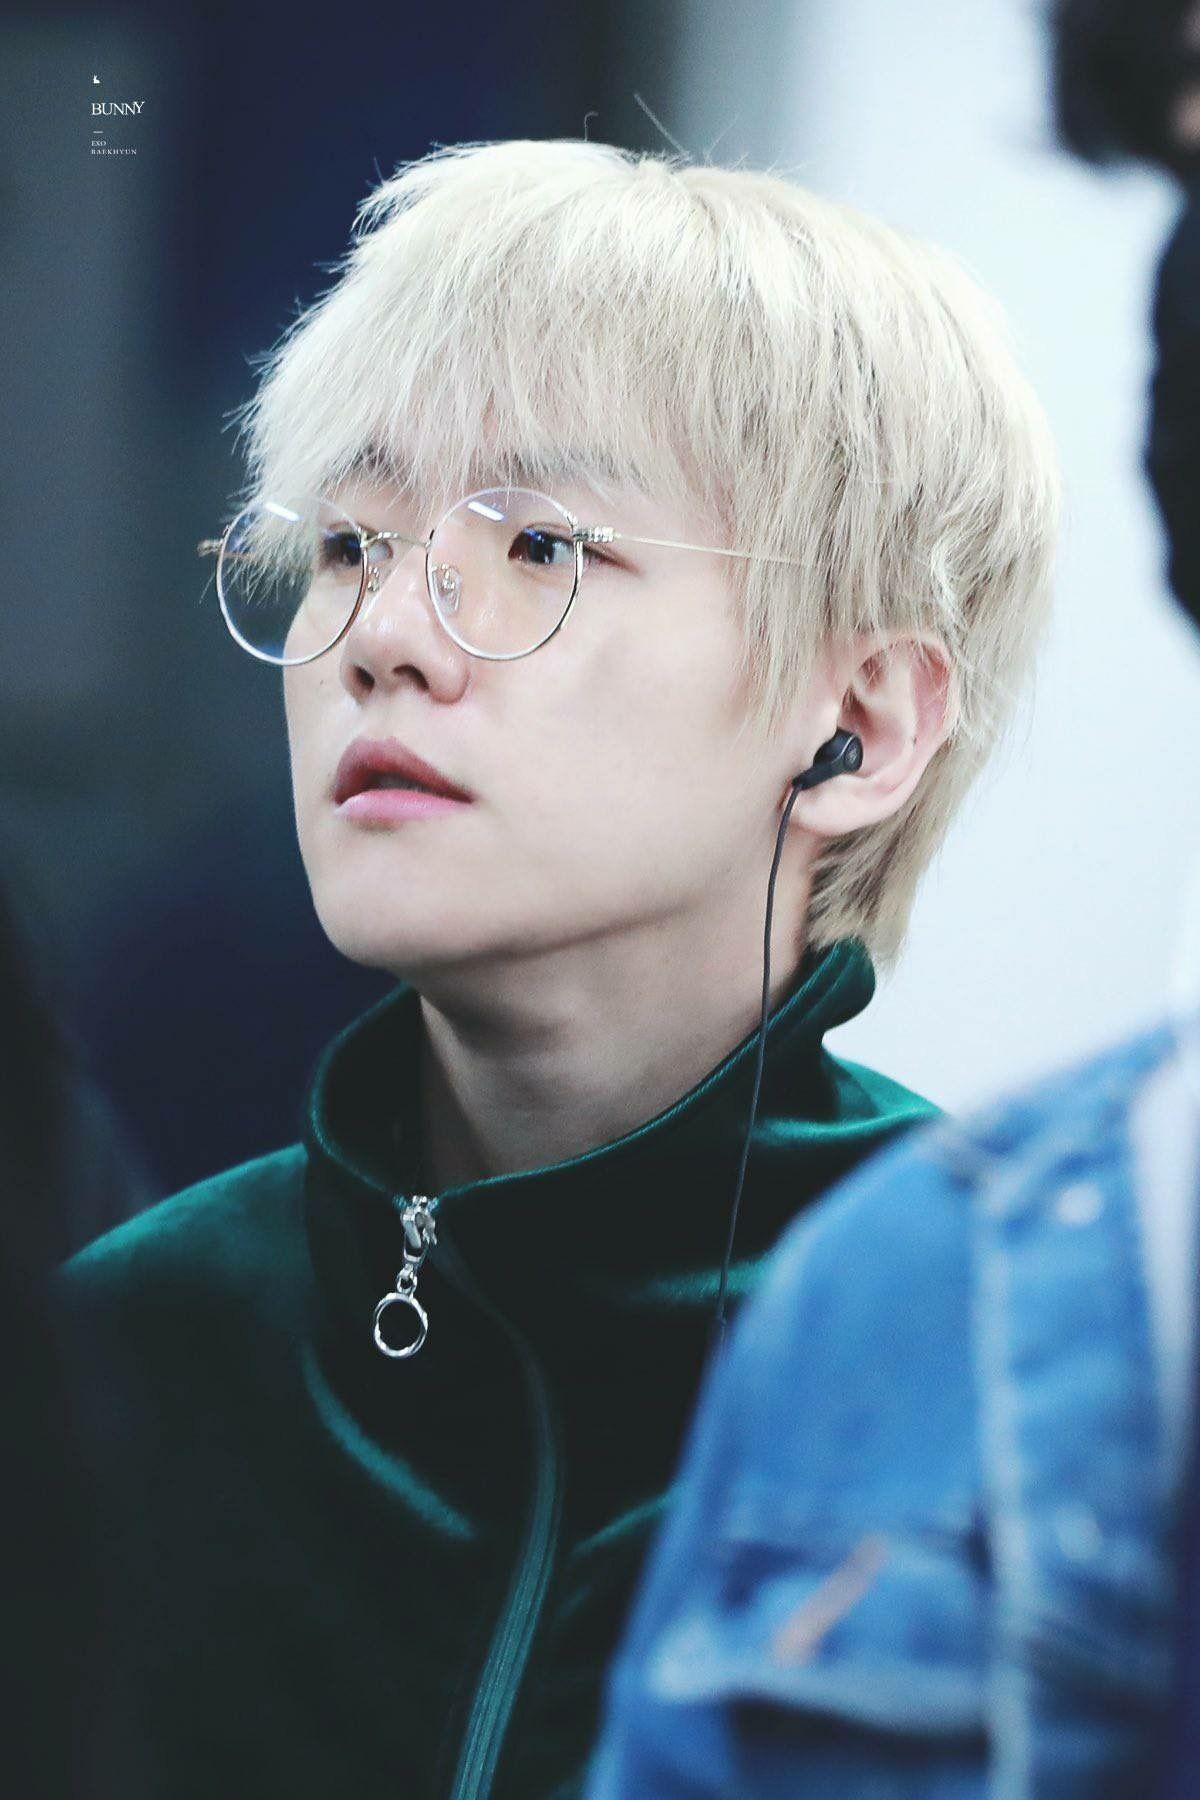 1 said hairstyle boy pin by beak rena on beakhuynuc  pinterest  baekhyun exo and kpop